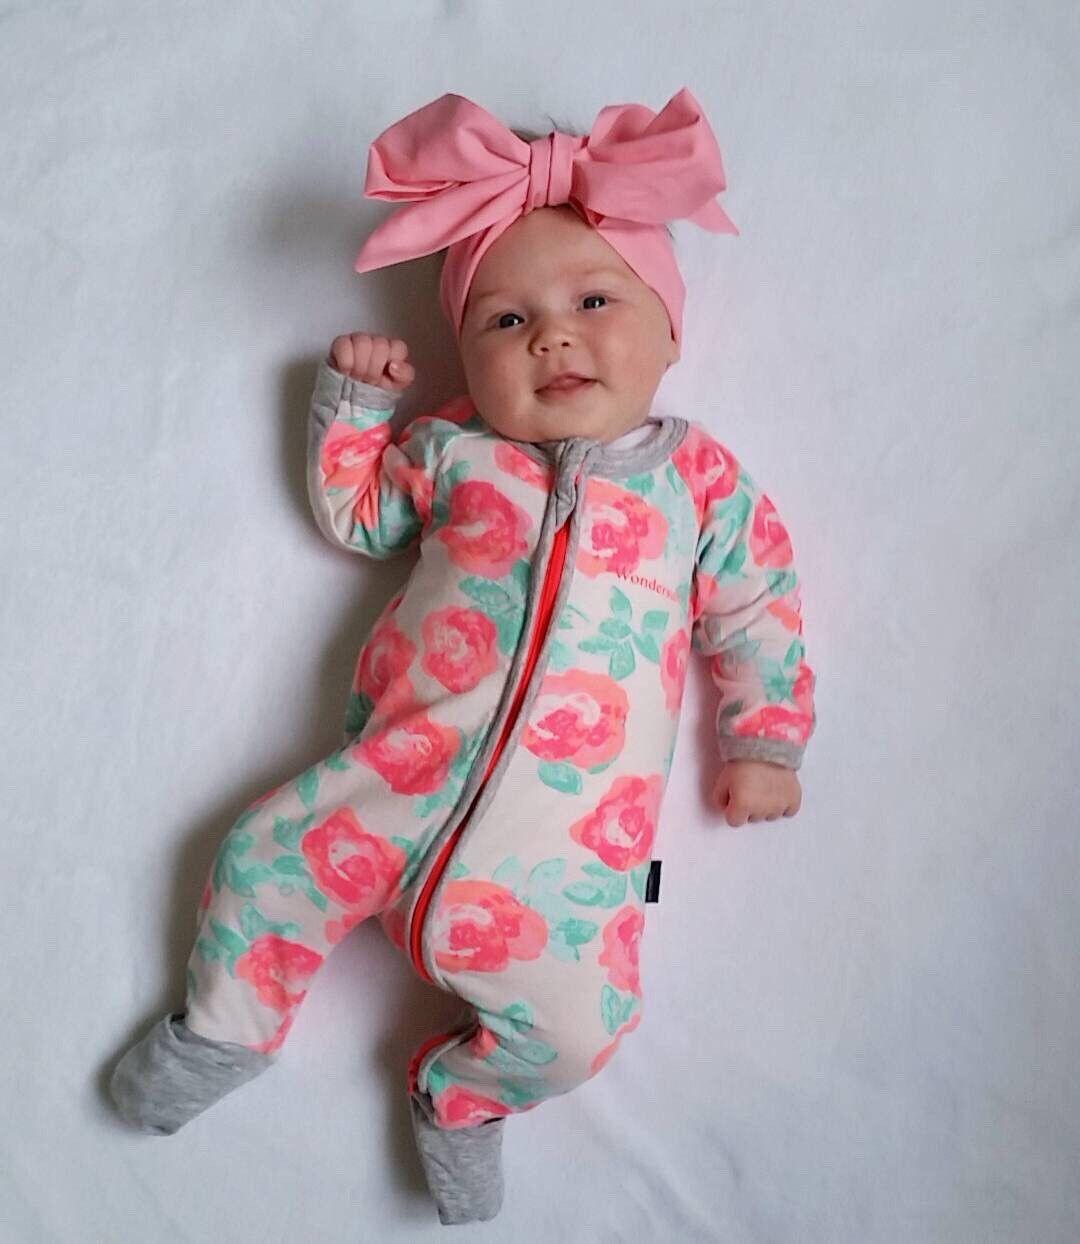 Newborn Baby Rose e Piece Outfit Winter Fall Long Sleeve